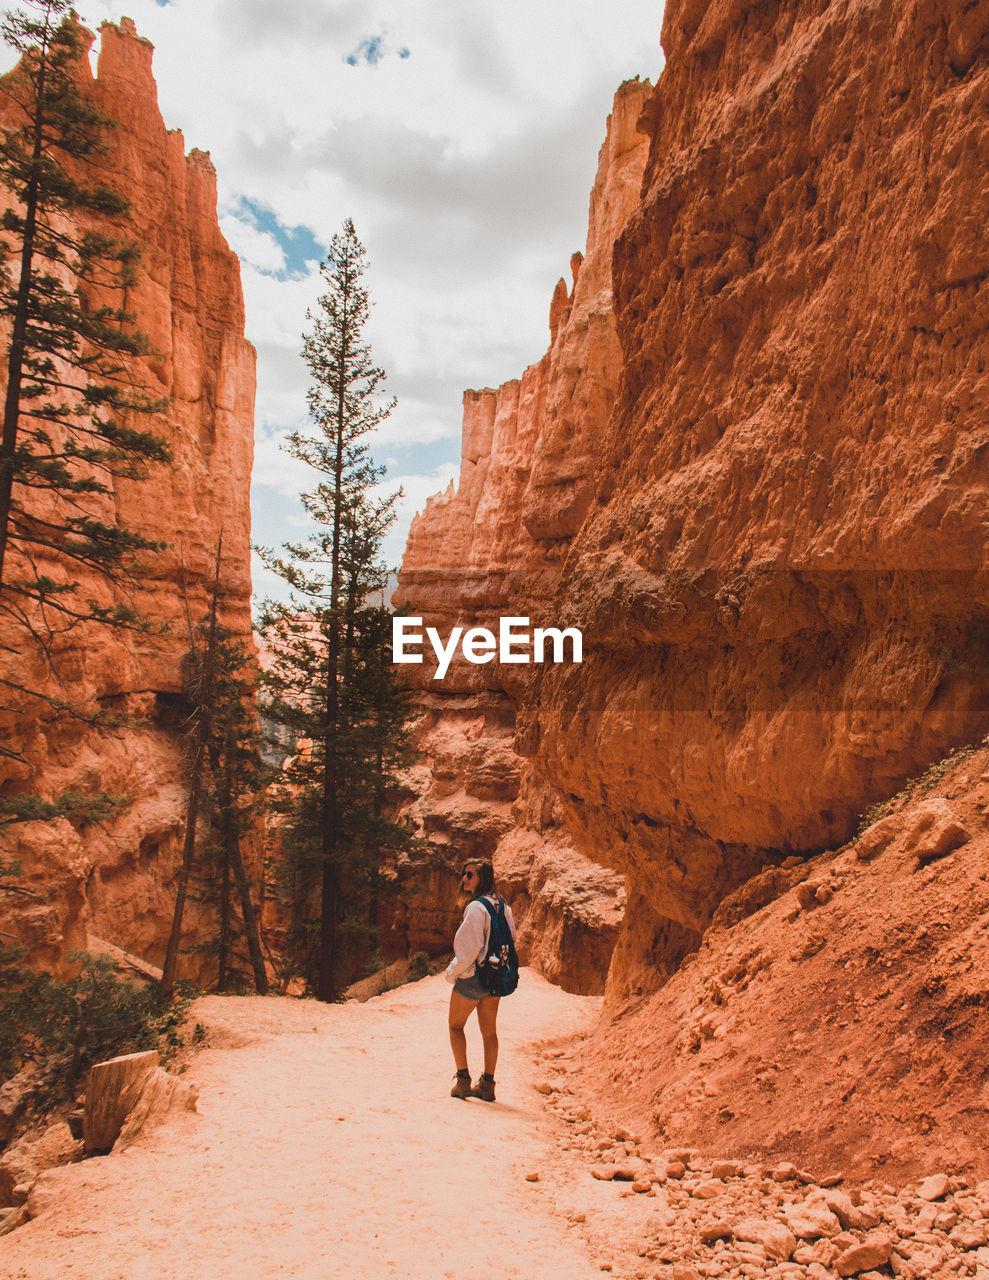 Young Woman Hiking At Bryce Canyon National Park